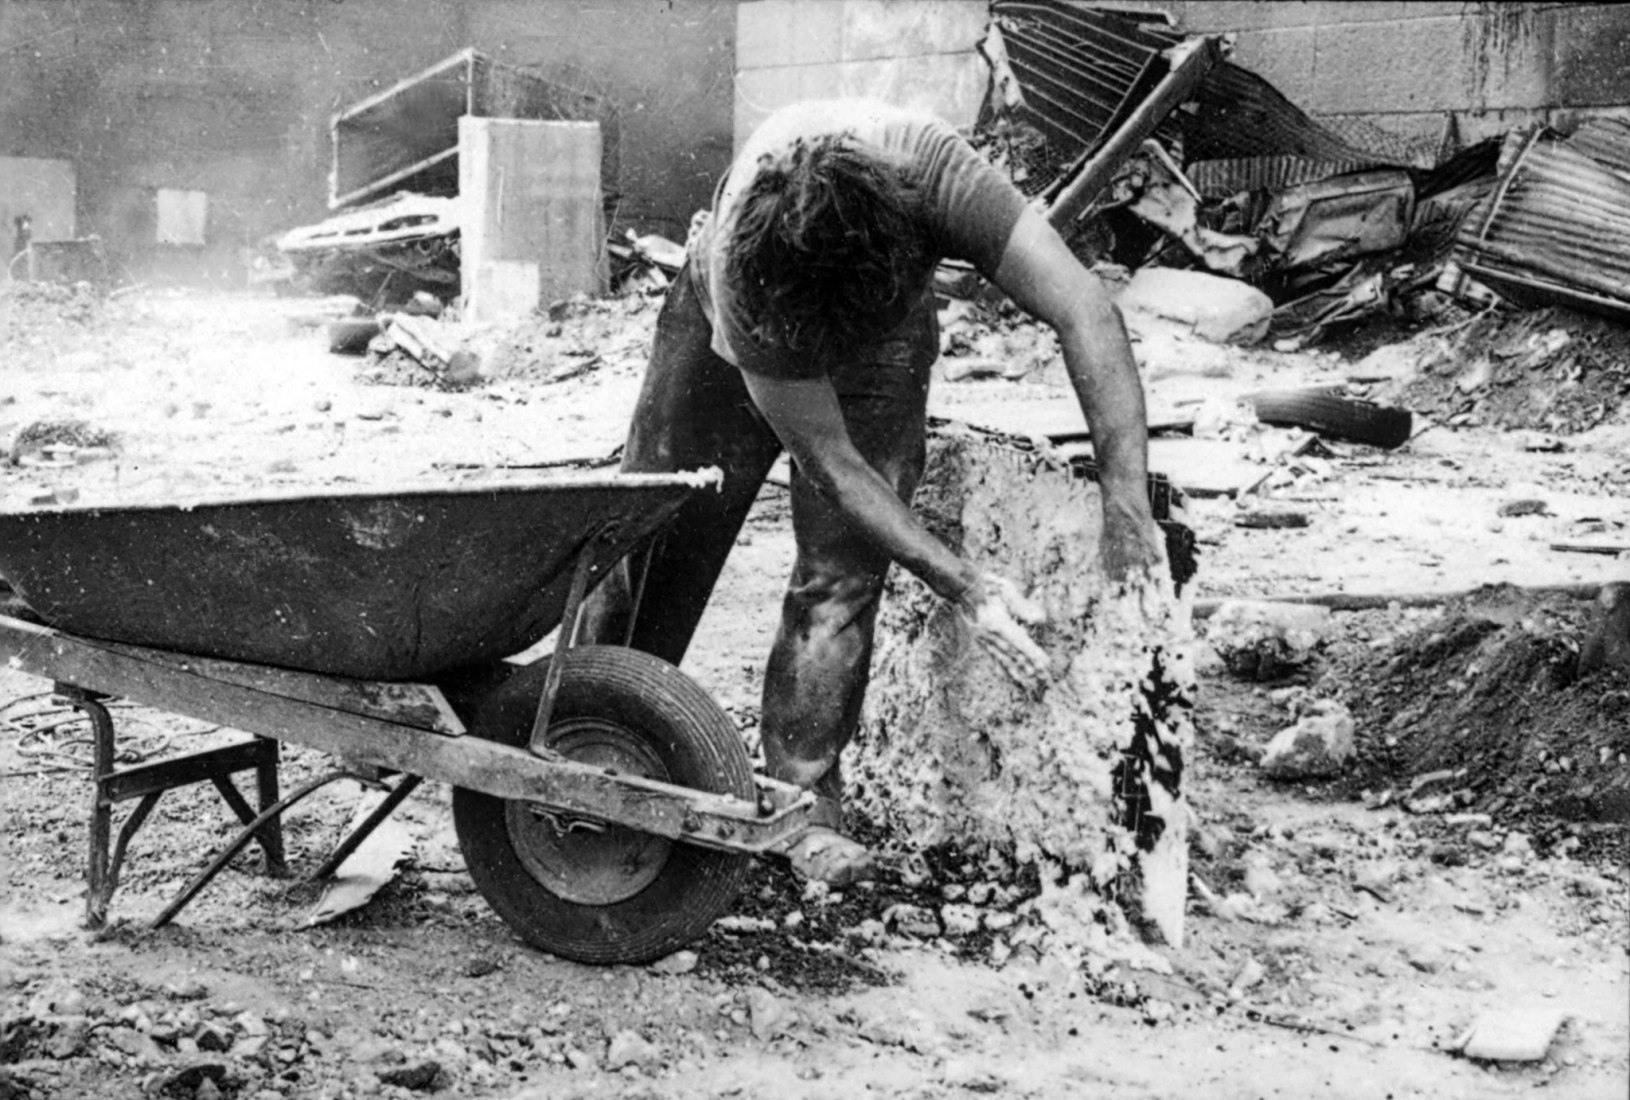 Gordon Matta-Clark, c. 1971 © The Estate of Gordon Matta-Clark / Artists Rights Society (ARS), Nueva York Cortesía The Estate of Gordon Matta-Clark y David Zwirner